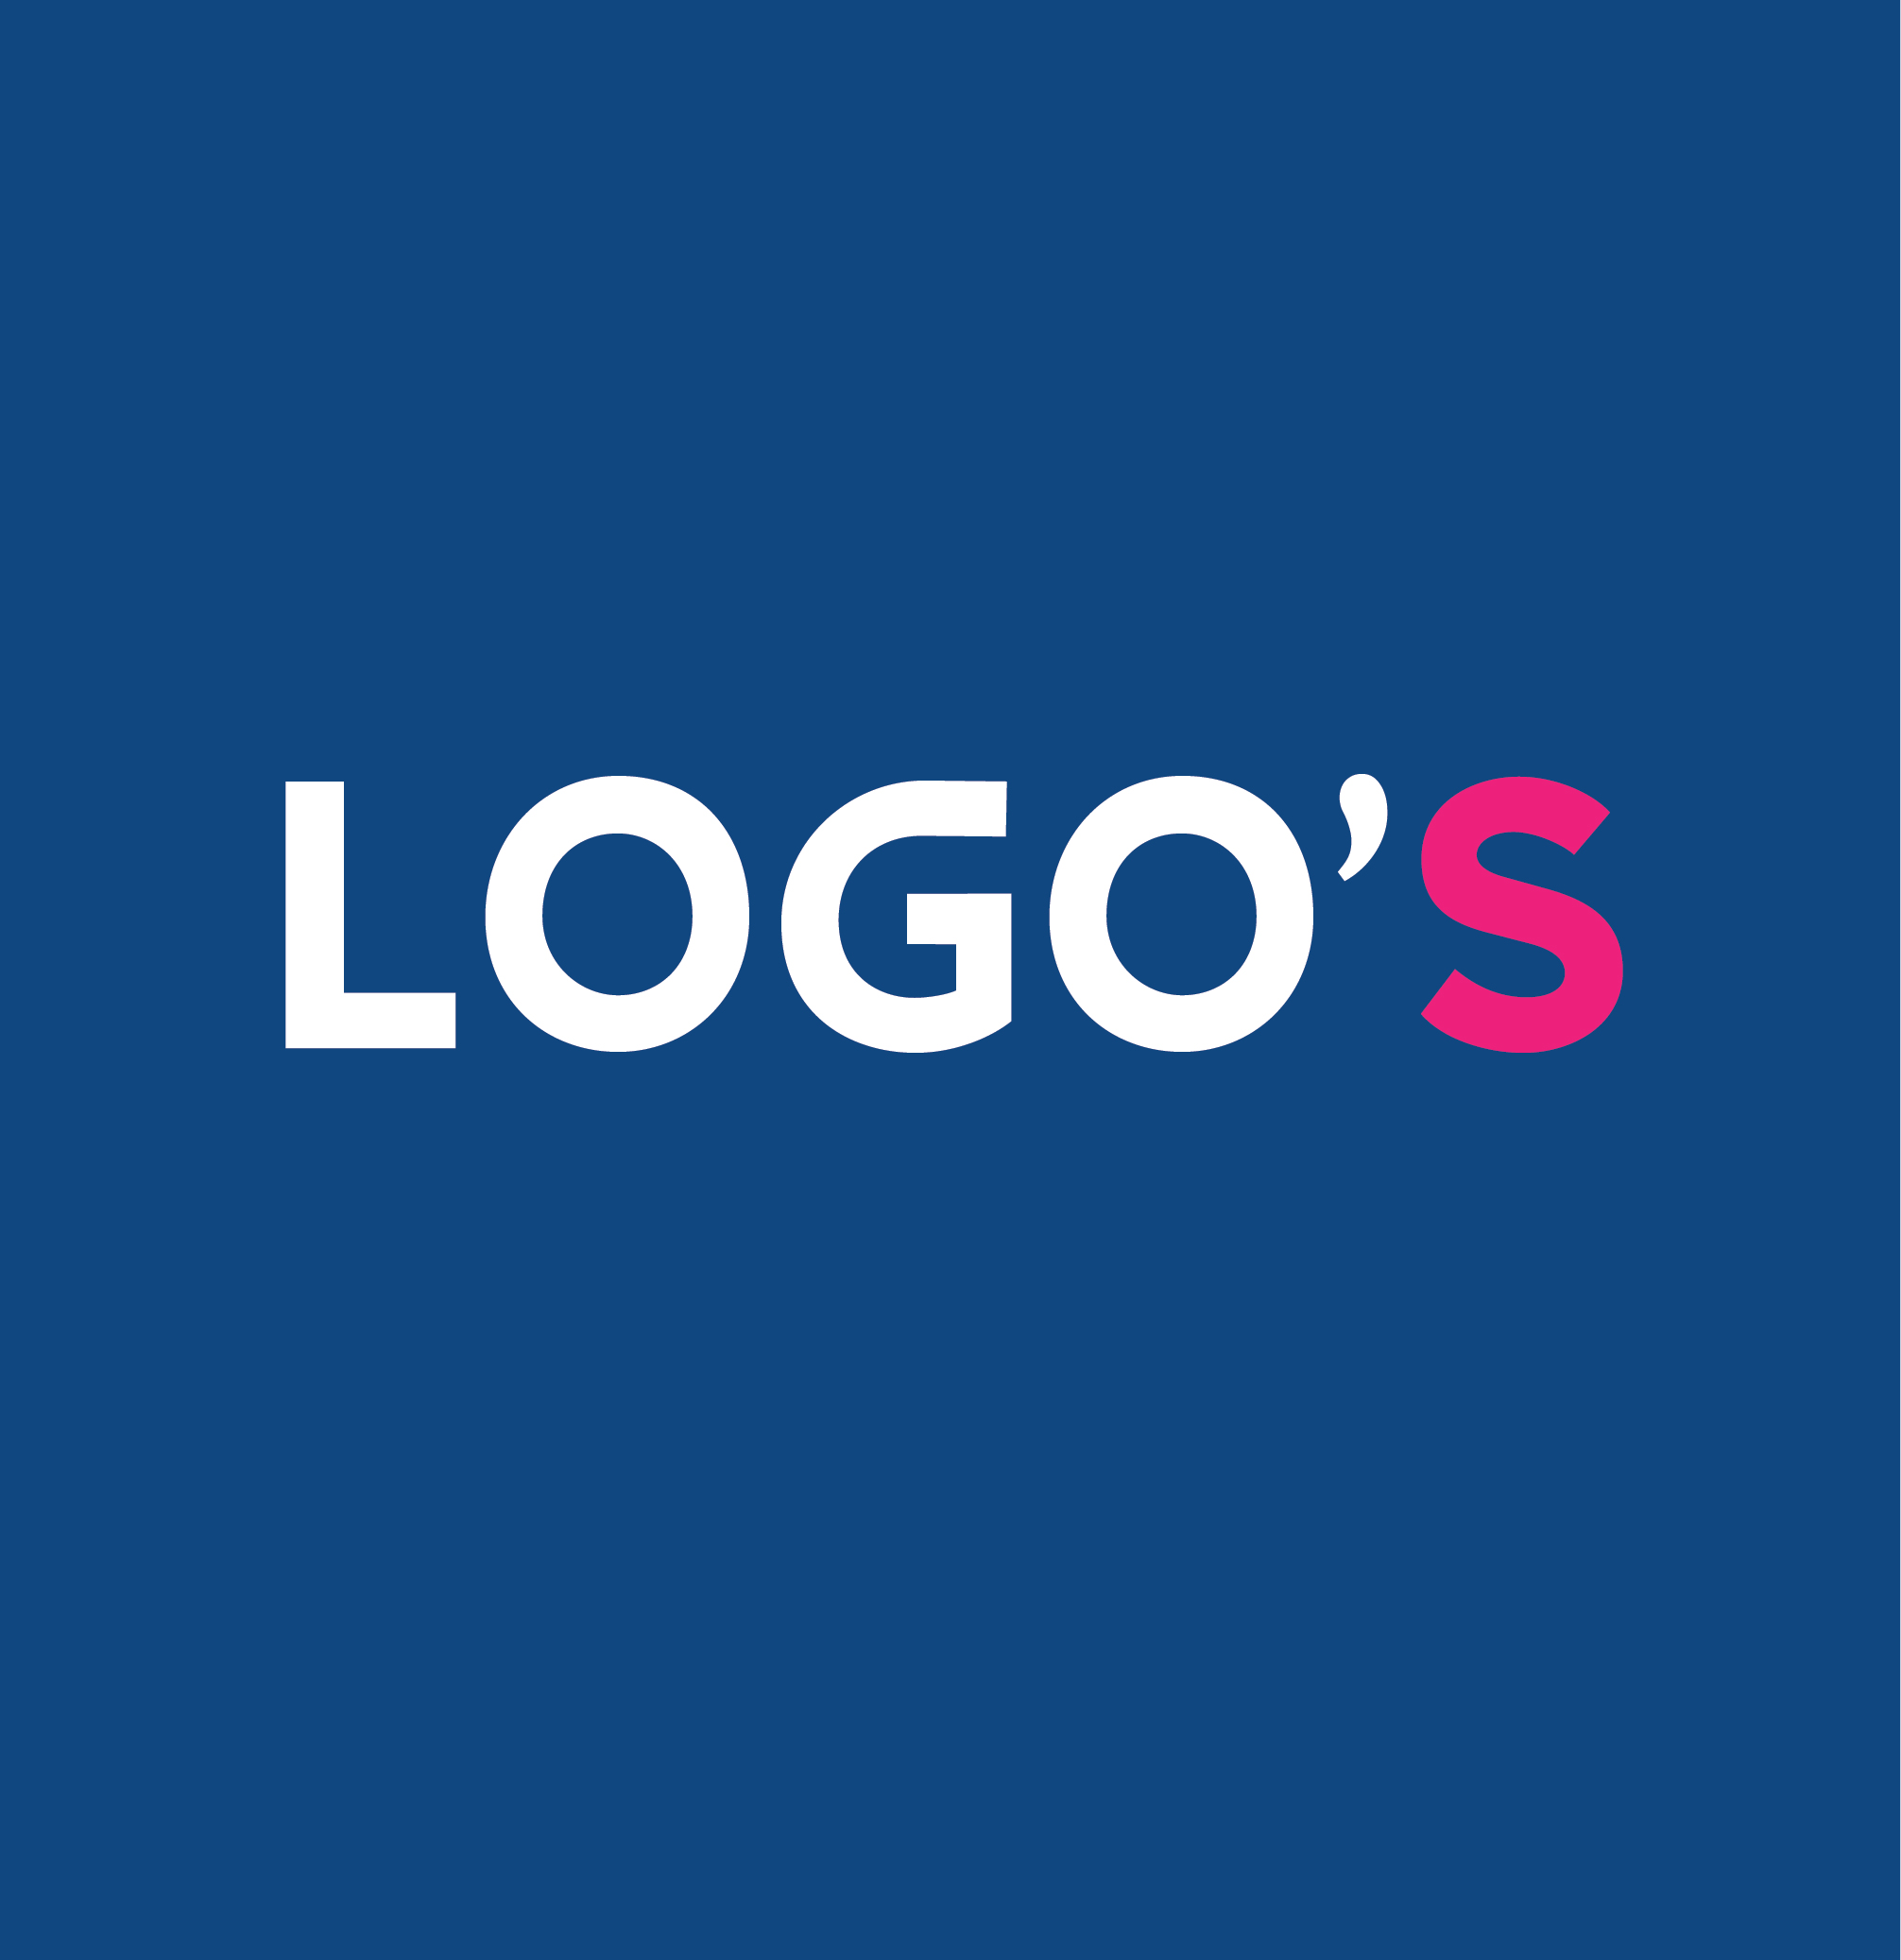 LOGOS_עטי דונט copy